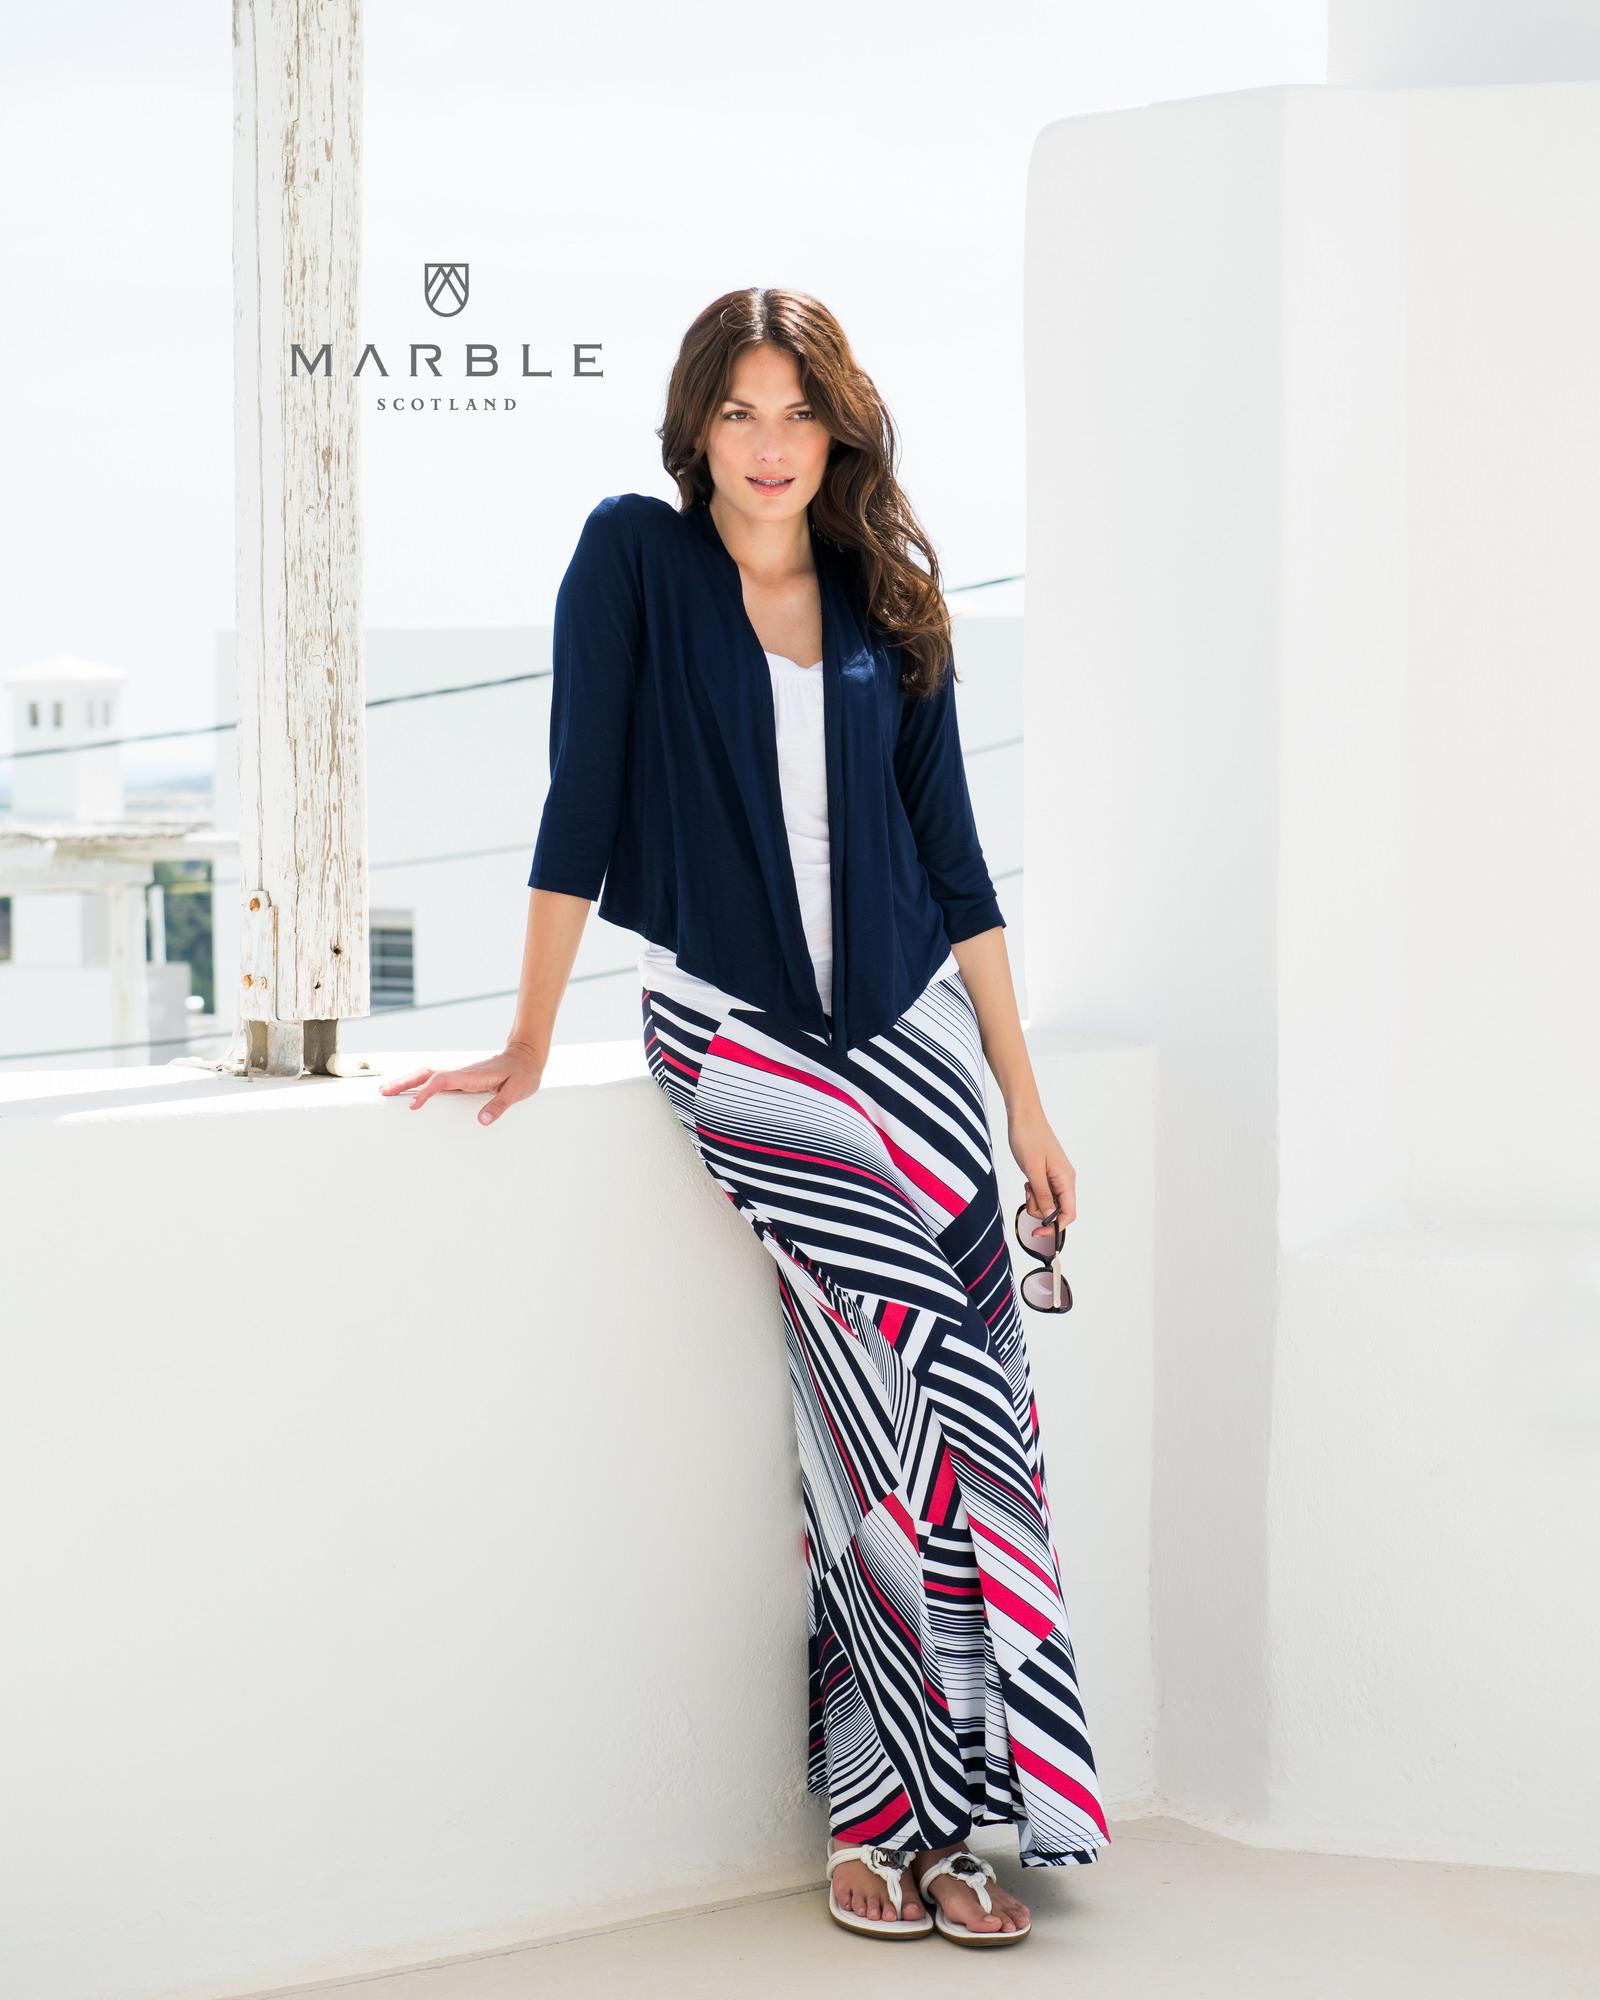 Marble – 5706 – (Colour 103)